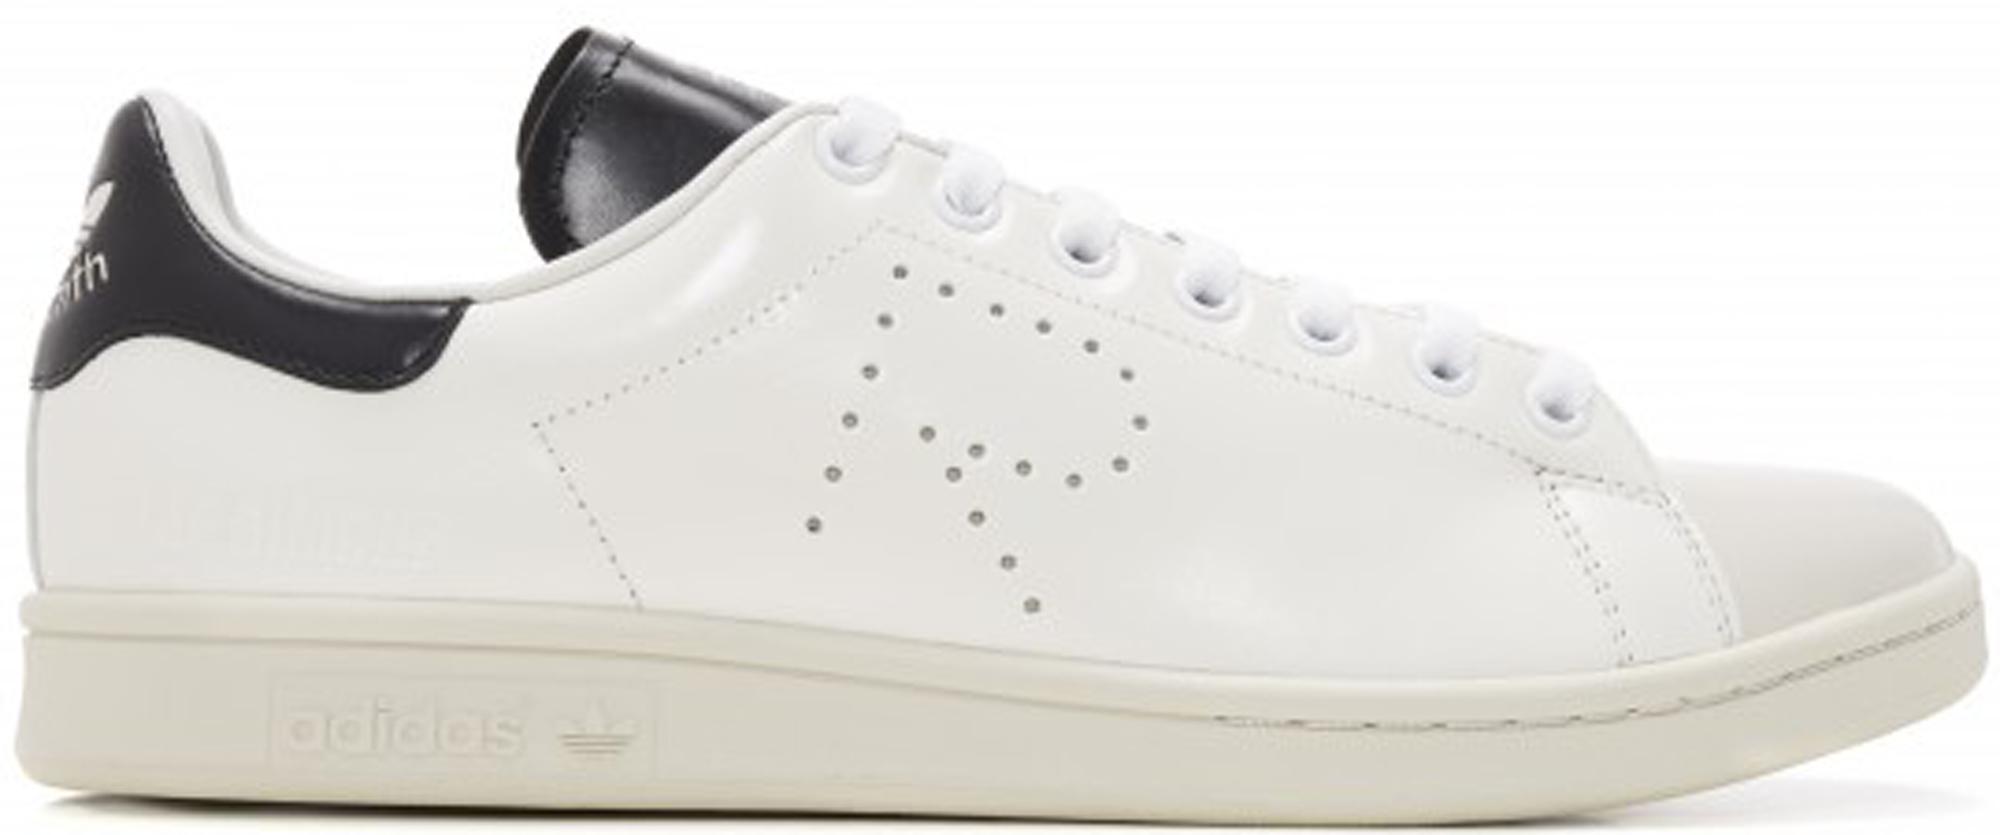 adidas stan smith triple white - Travbeast 9c32e43b8